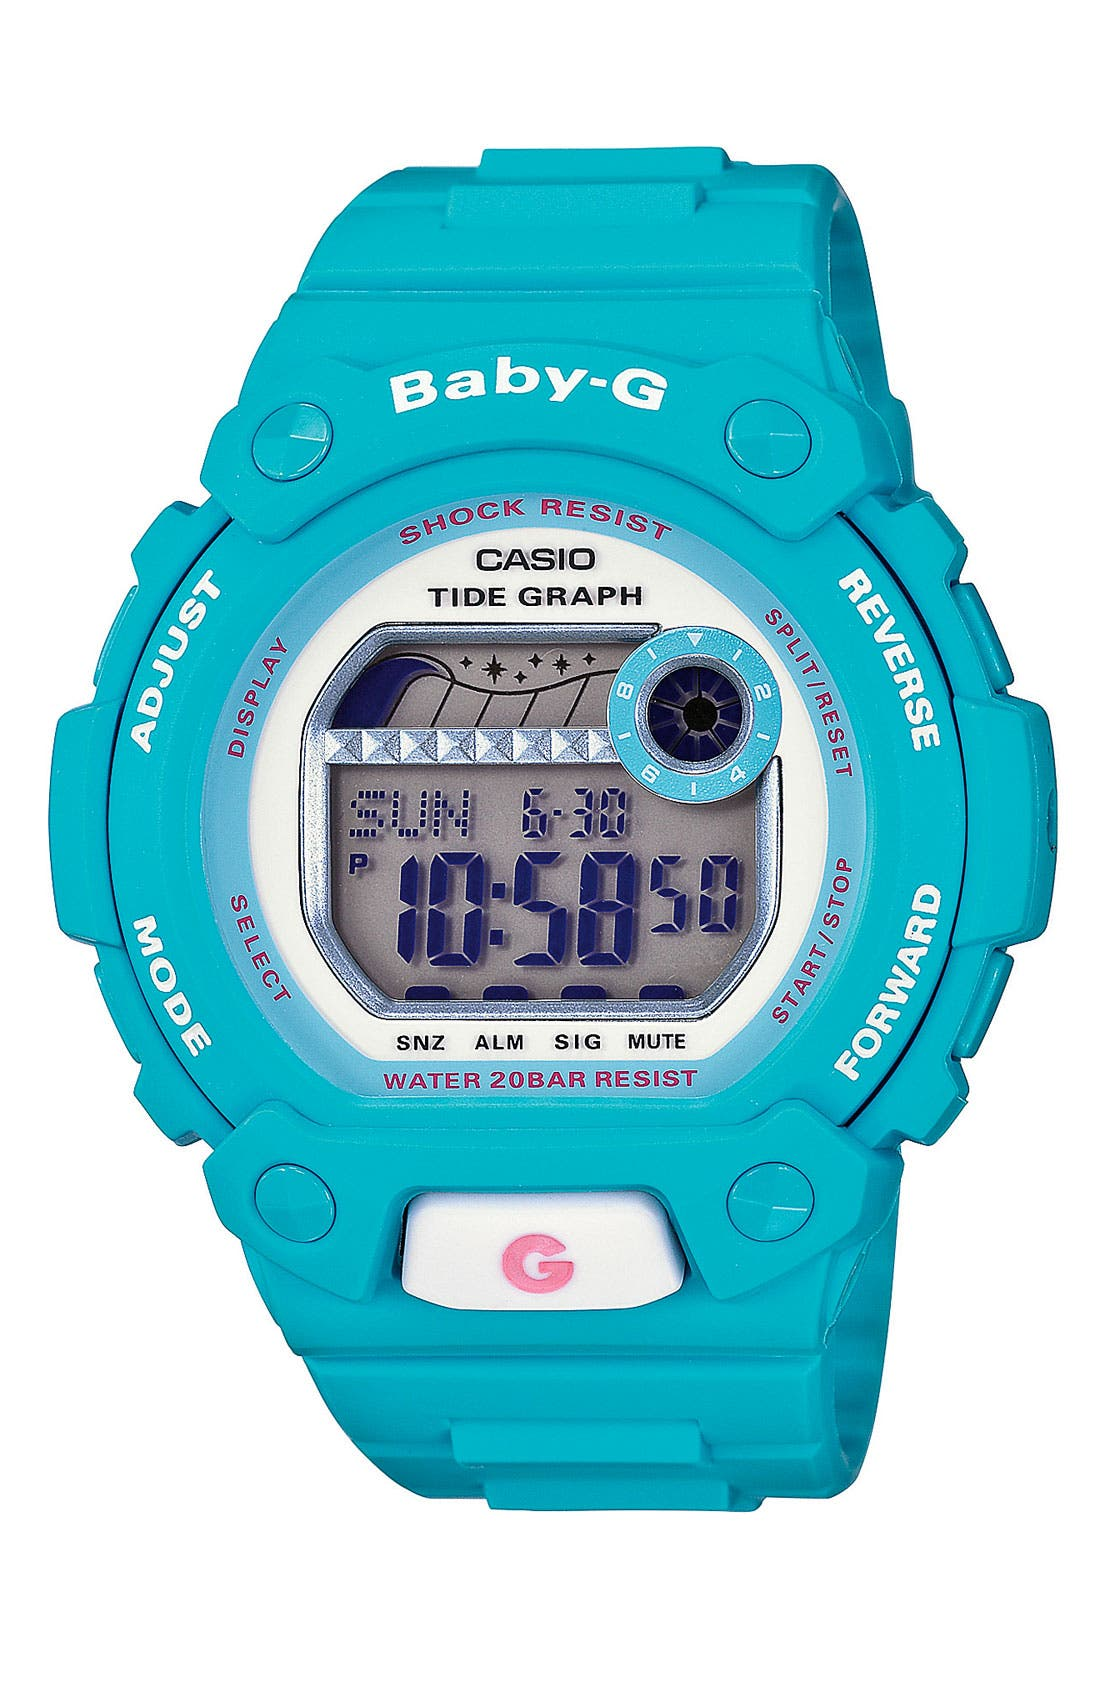 Main Image - Baby-G 'Tidegraph' Digital Watch, 44mm x 42mm